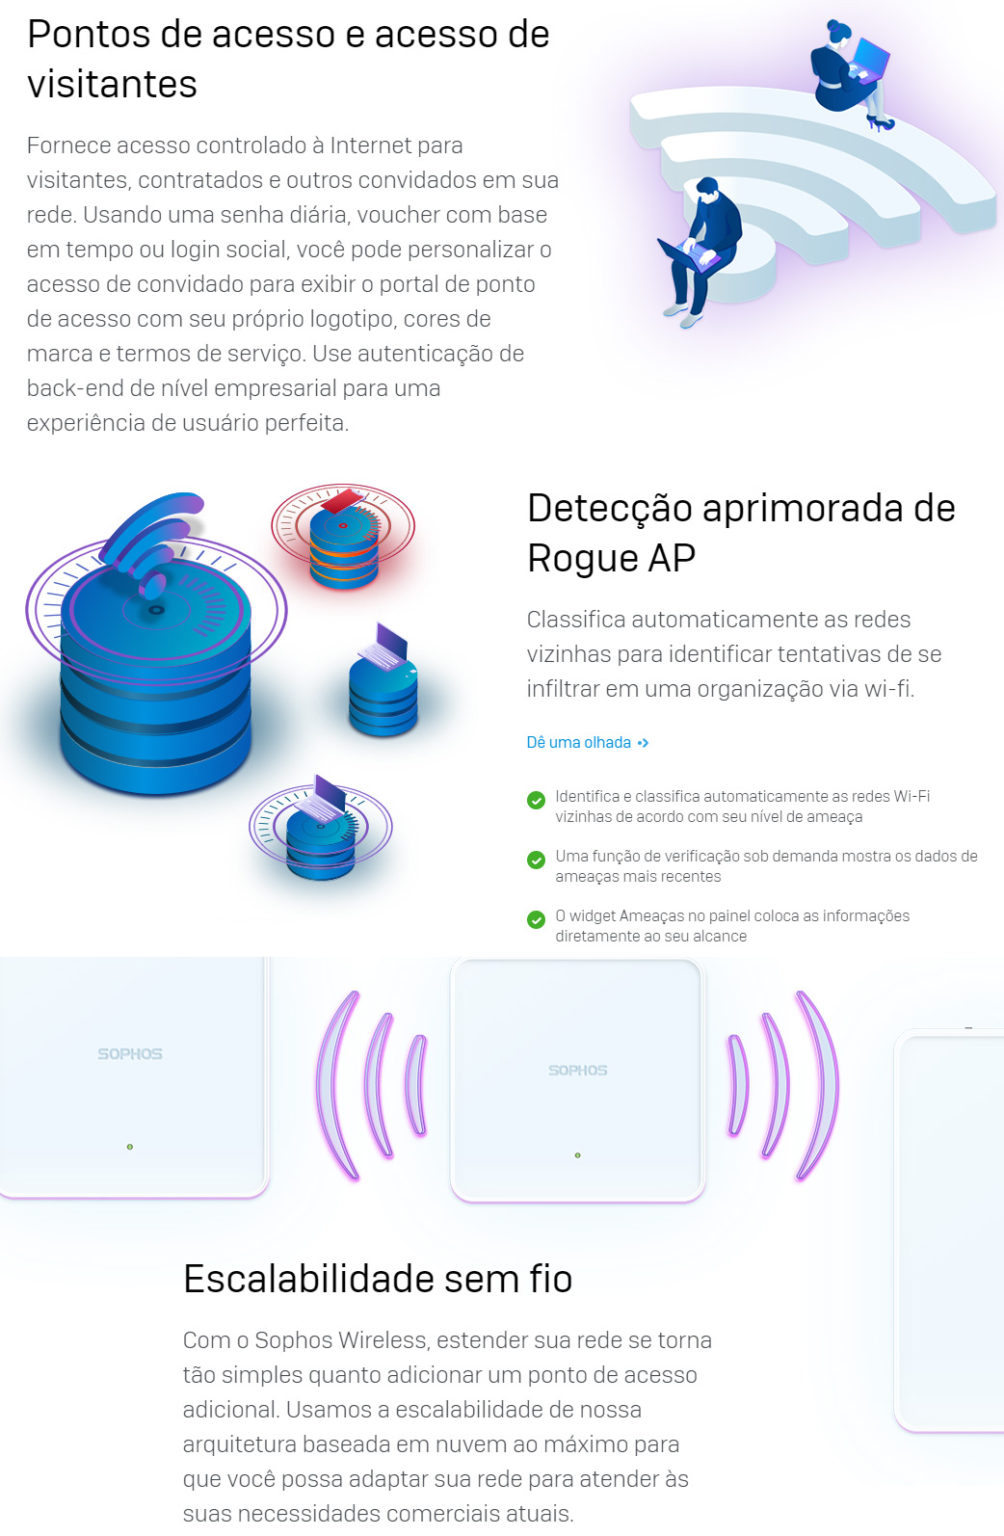 pontos-sophos-wireless